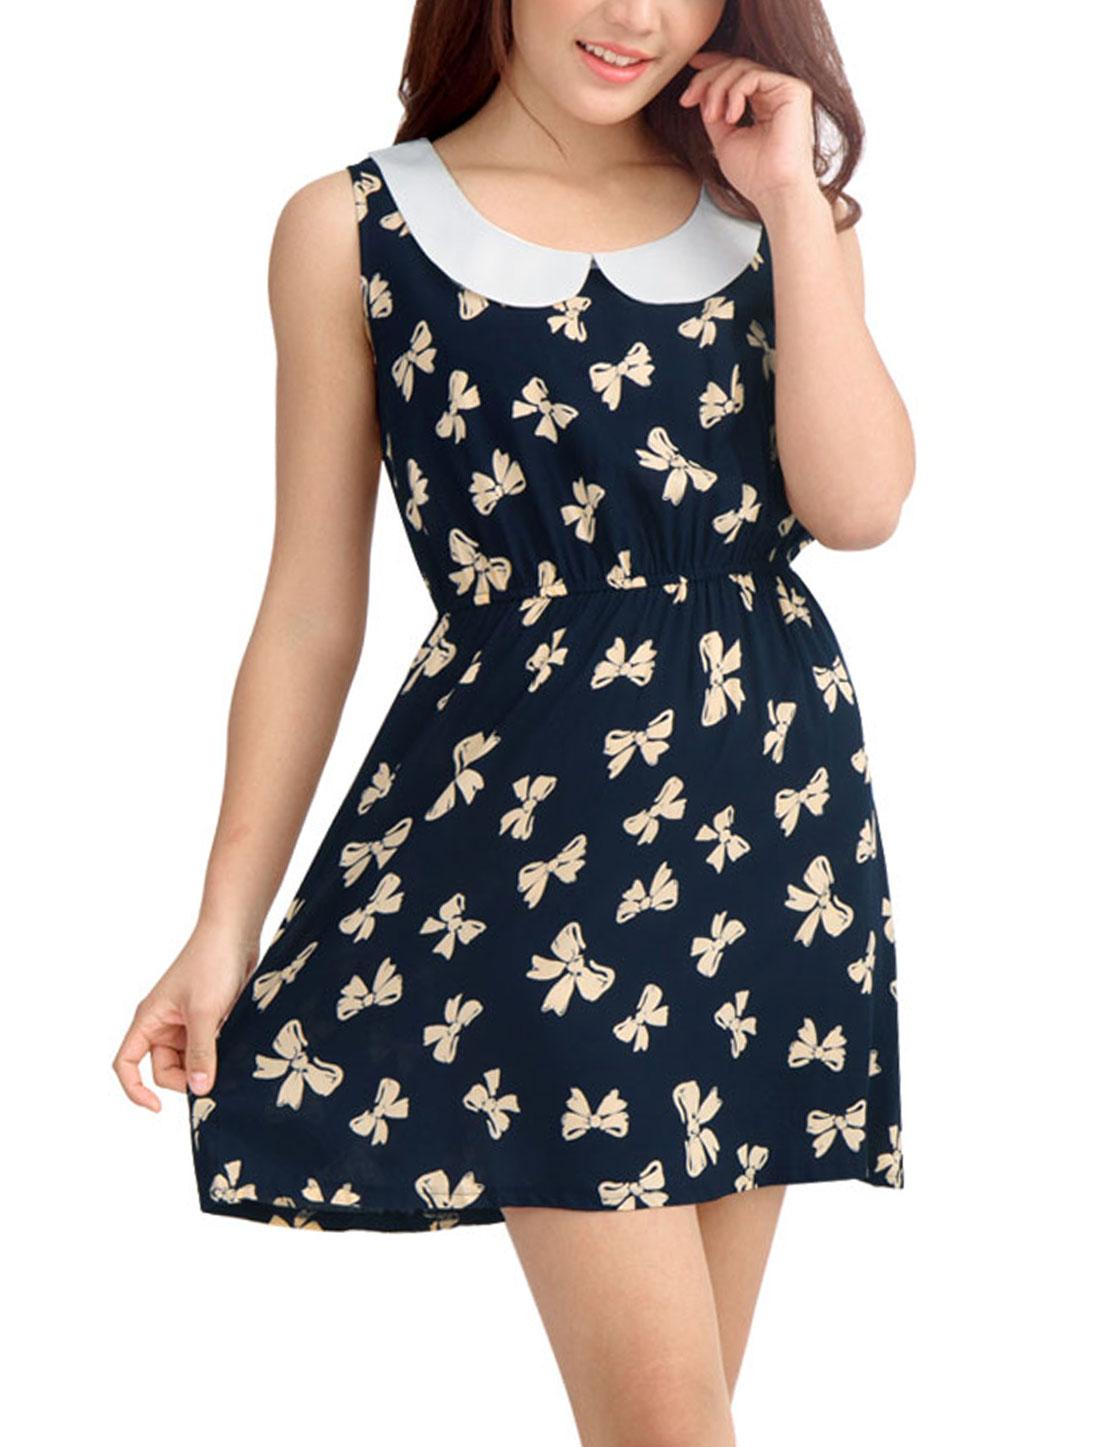 Women Sleeveless Bowknot Pattern Sweet Tank Dress Dark Blue S